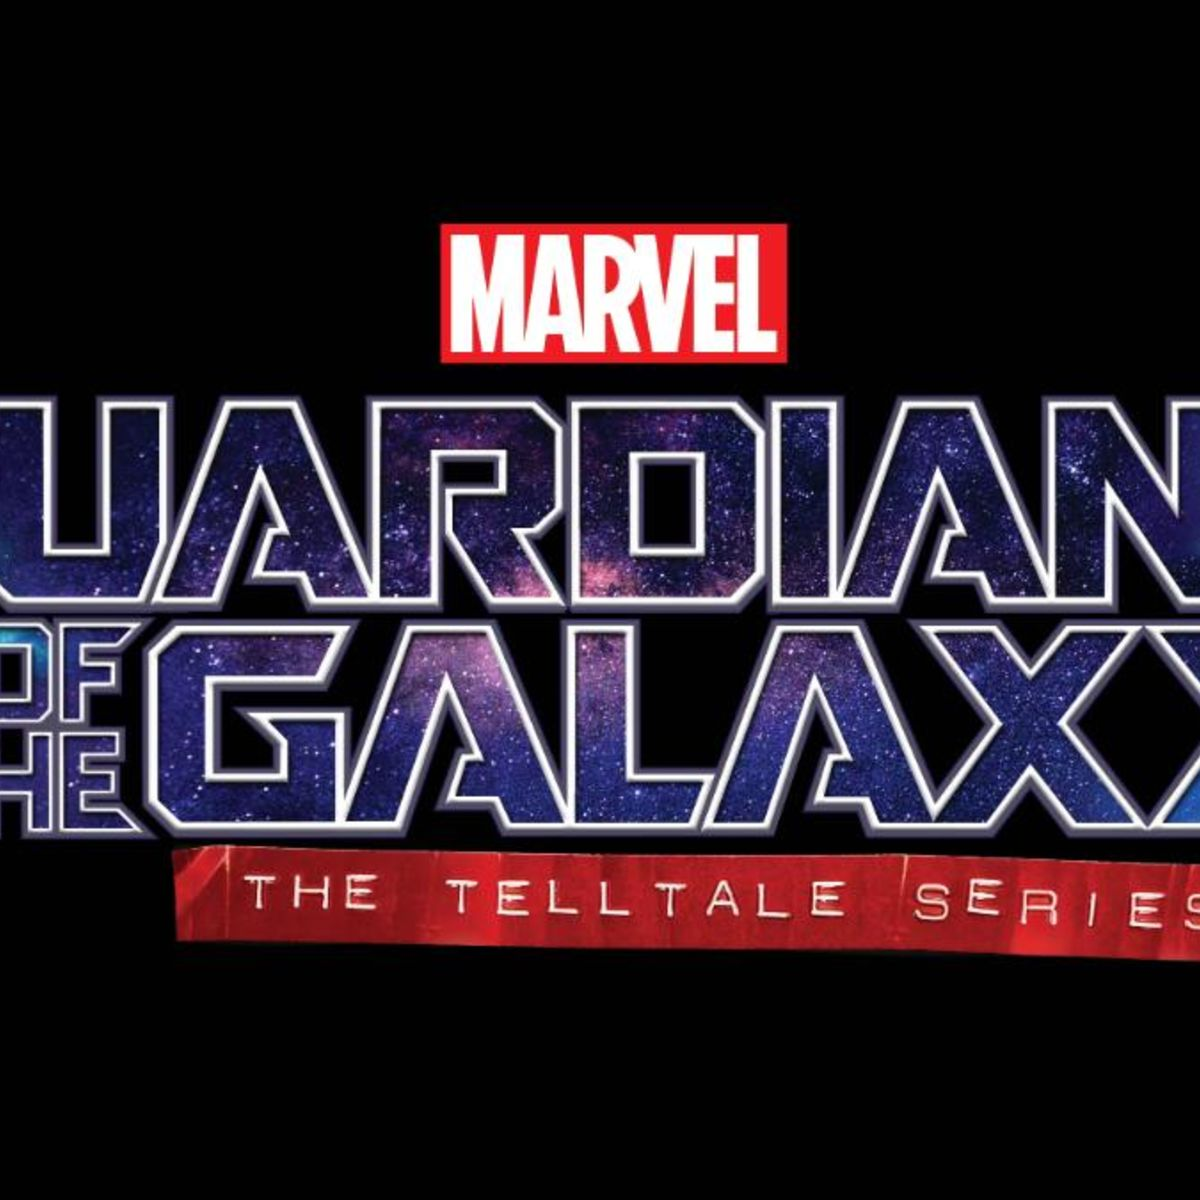 Guardians-of-the-Galaxy-Telltale.jpg